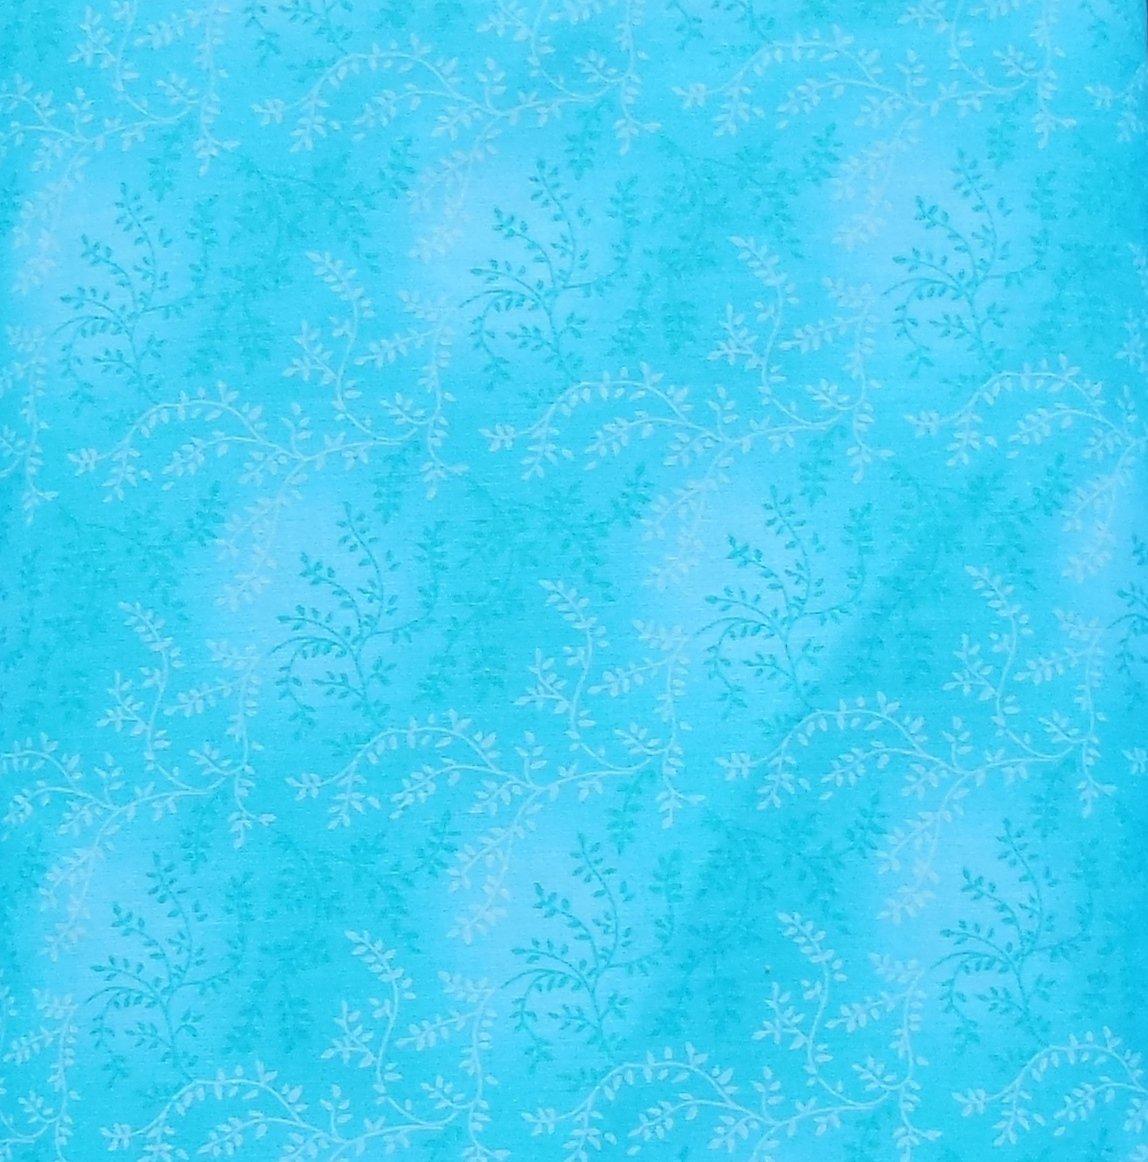 108 Wide Teal/Aqua Vine Backing Fabric